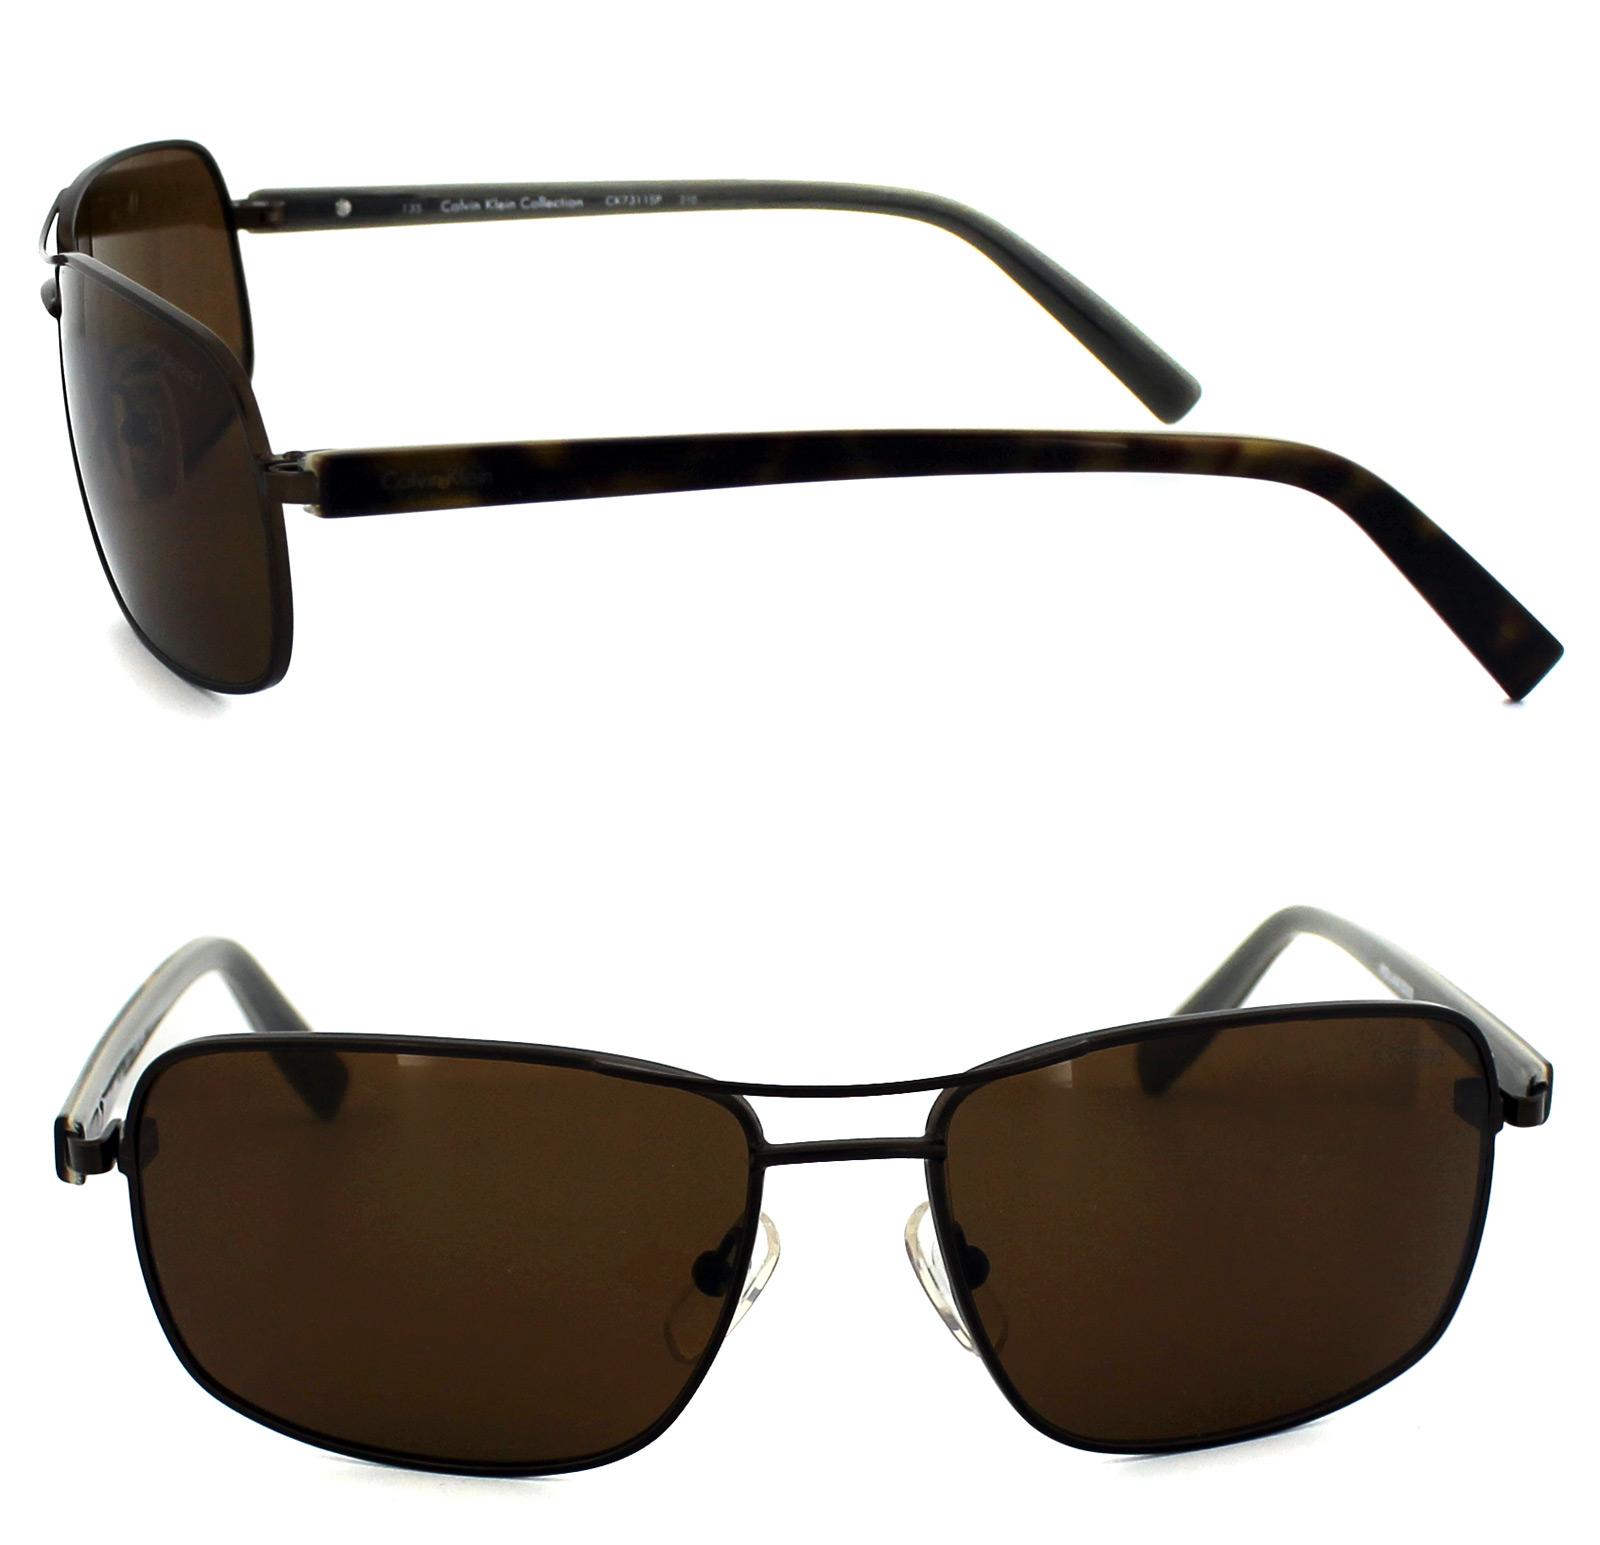 4c43280a01 Sentinel Calvin Klein Sunglasses 7311SP 210 Brown   Havana Brown Polarized